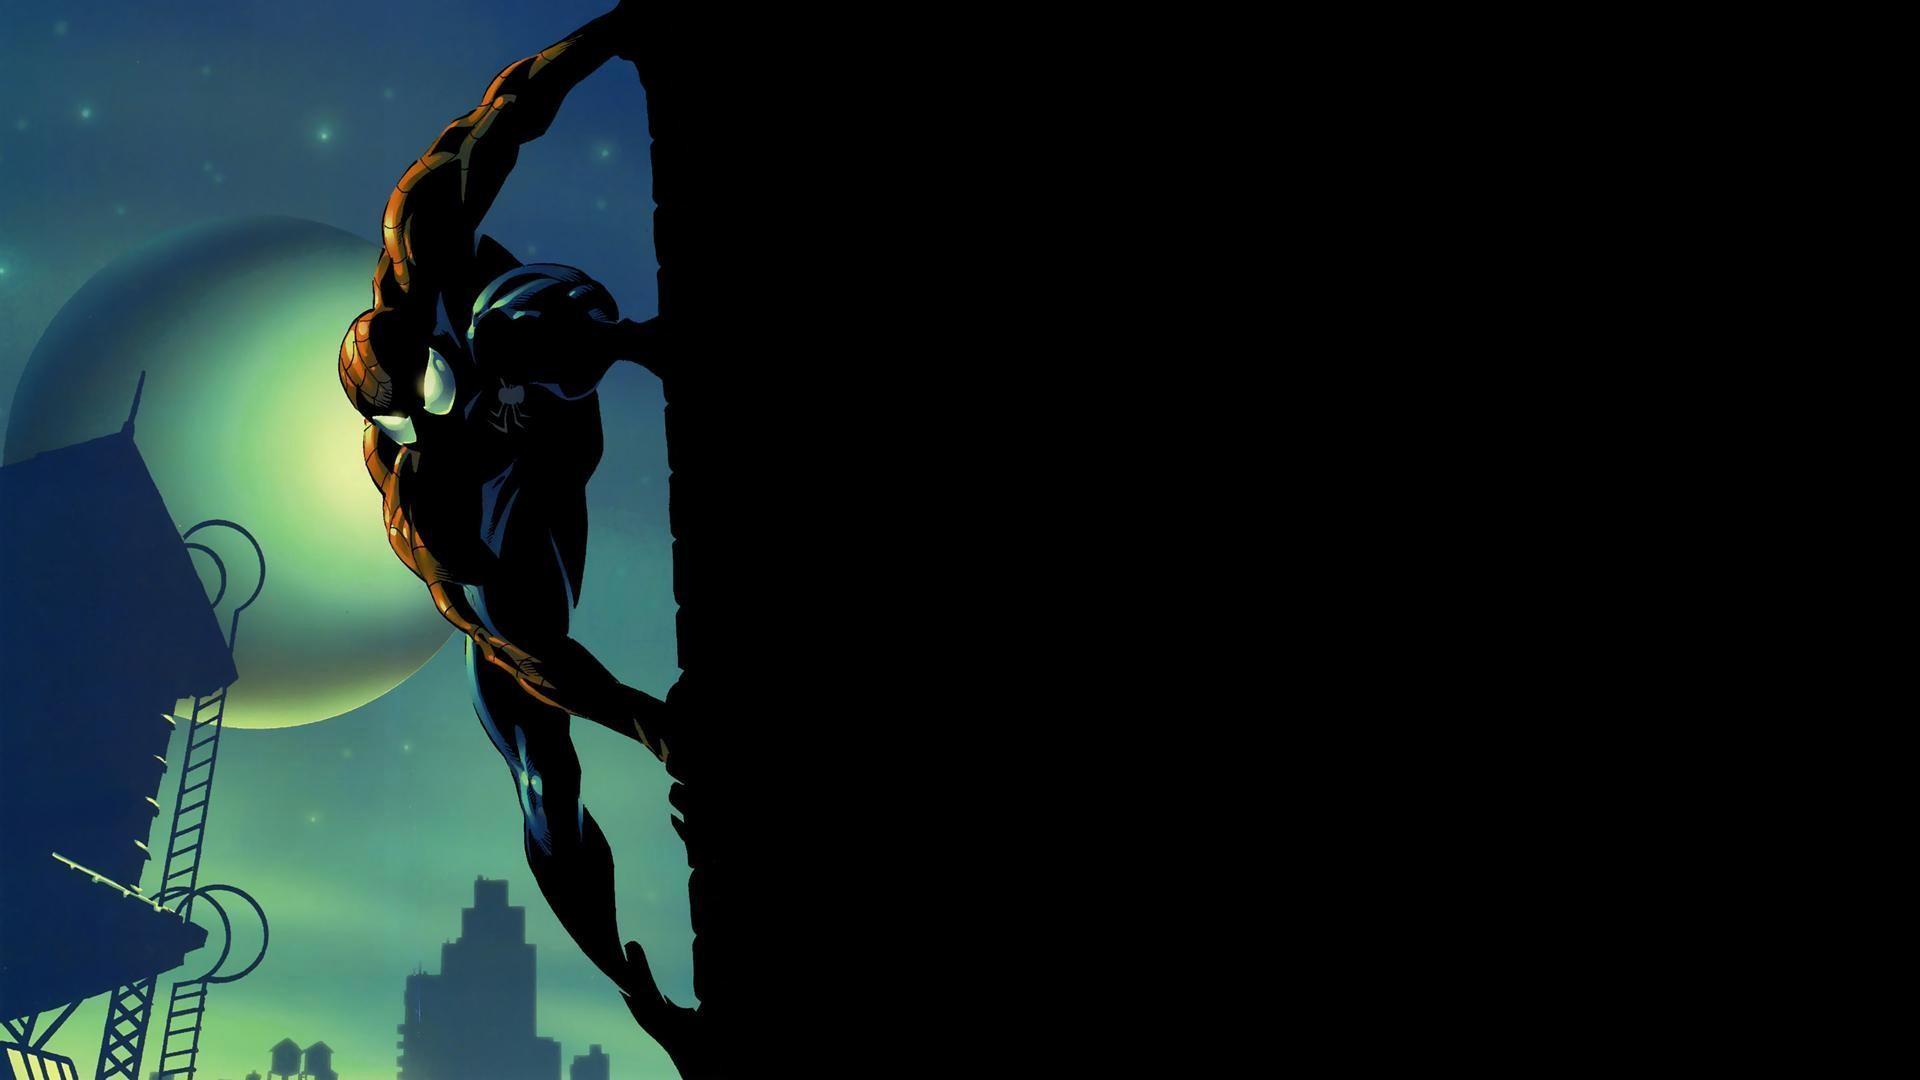 wallpaper.wiki-Black-Spiderman-Iphone-Photo-PIC-WPD0011556